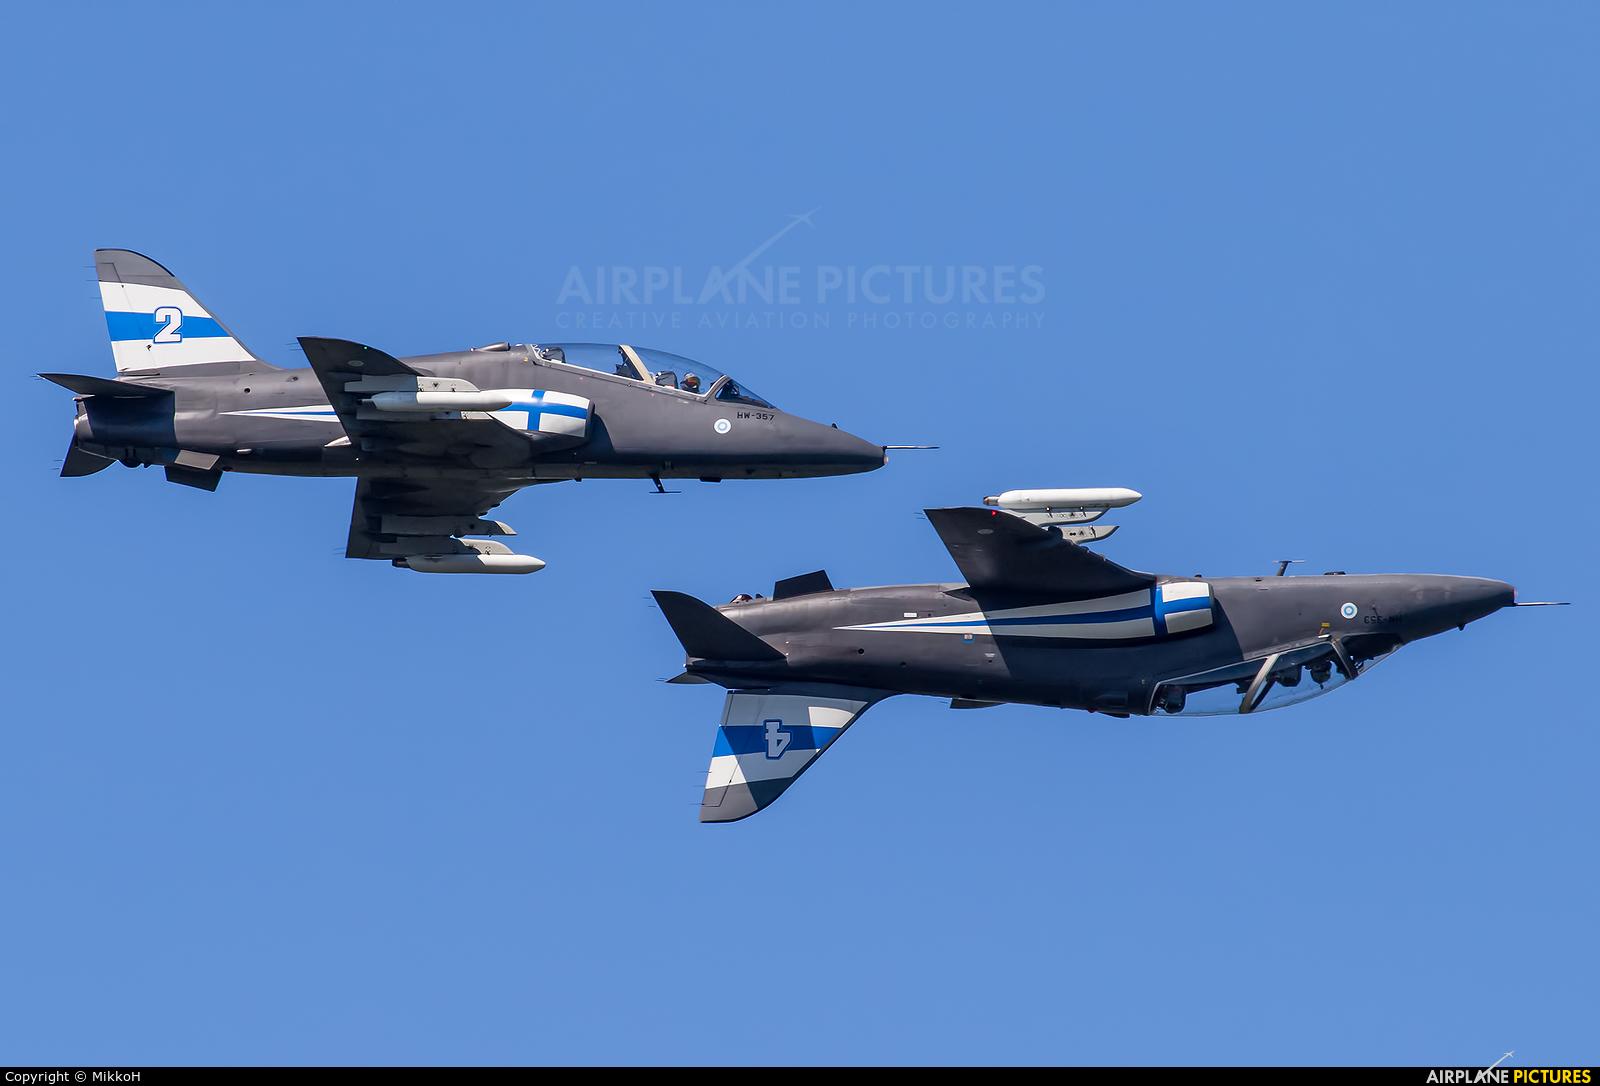 Finland - Air Force: Midnight Hawks HW-357 aircraft at Turku